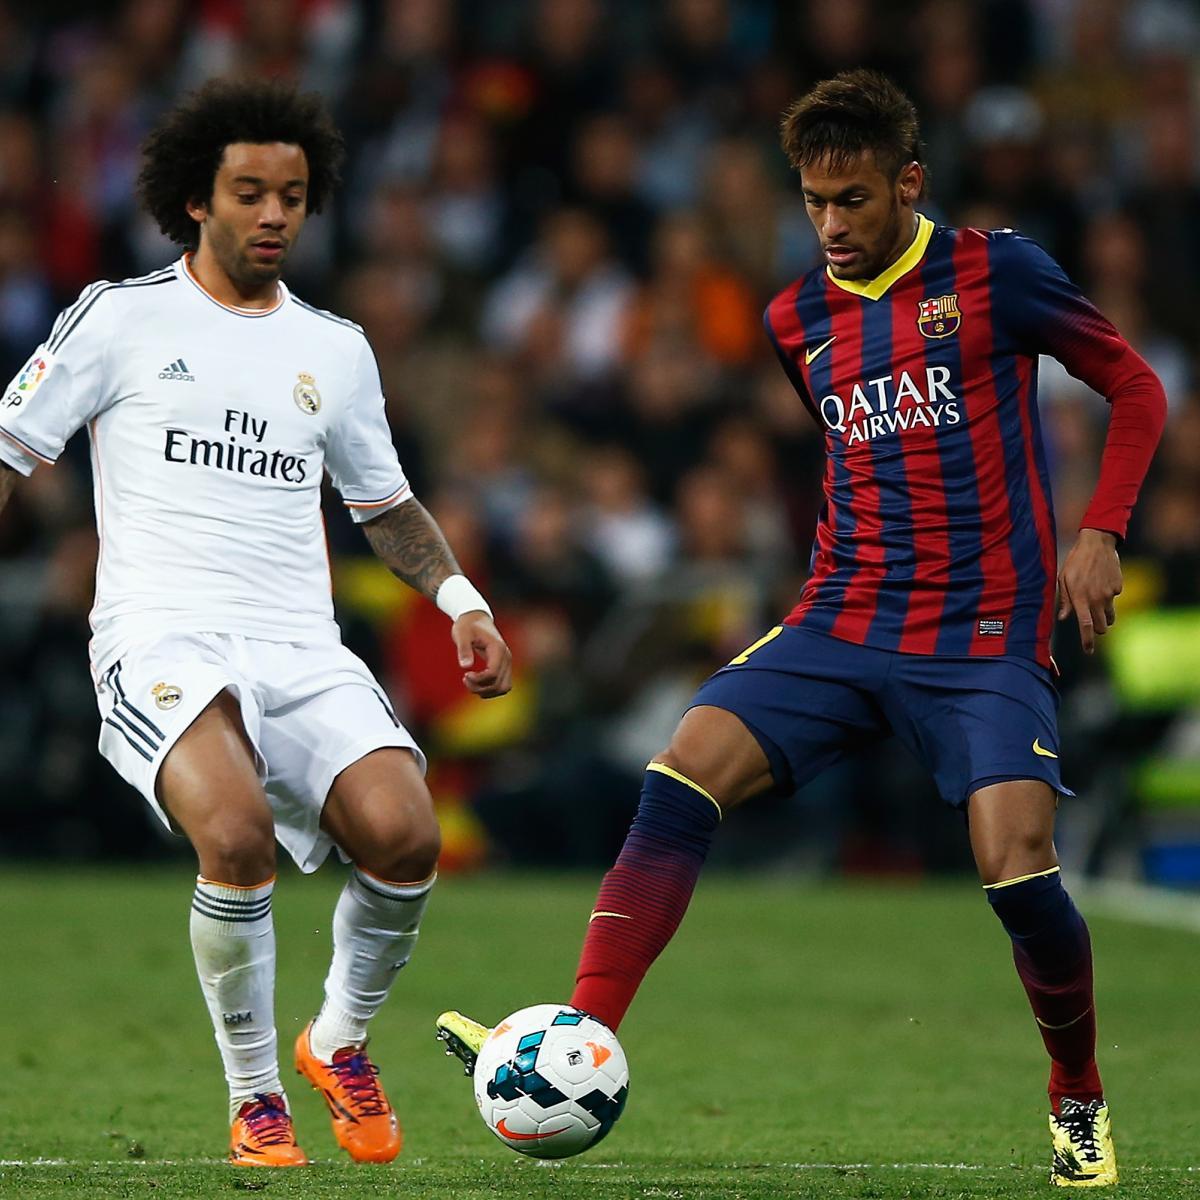 Copa Del Rey Final 2014: Real Madrid Vs. Barcelona Live